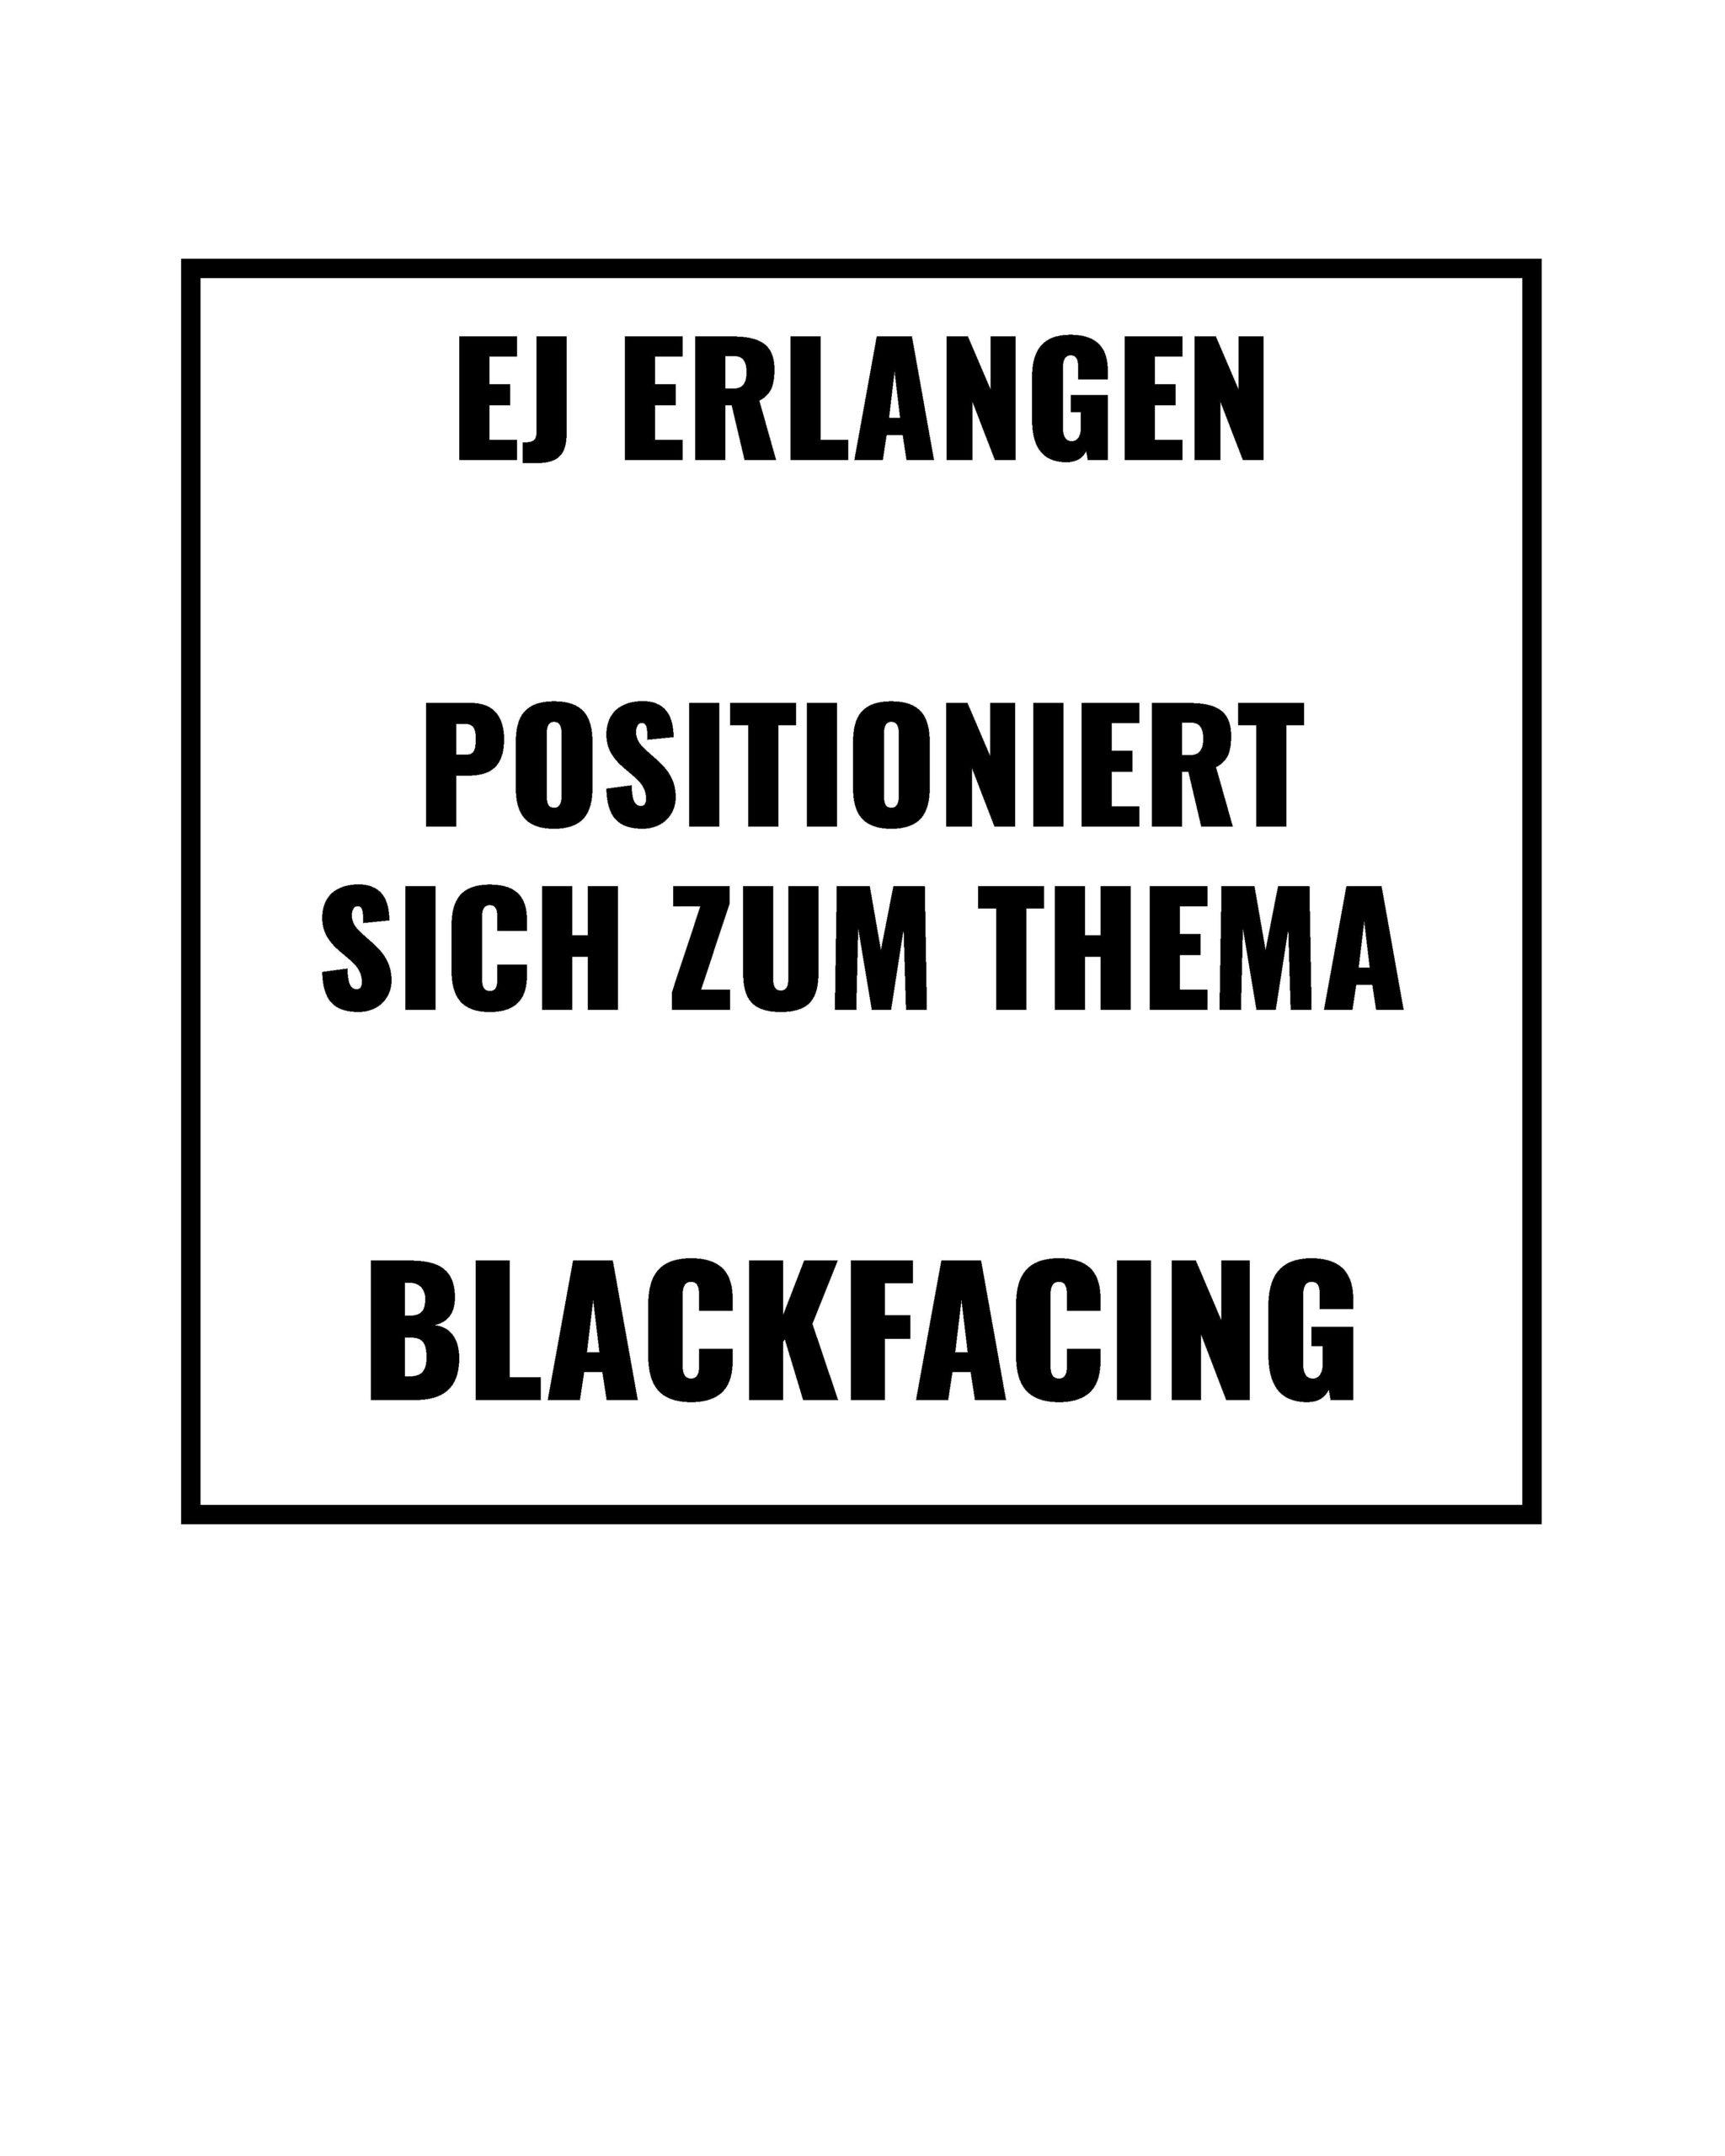 Unsere Stellungnahme zu BLACKFACING